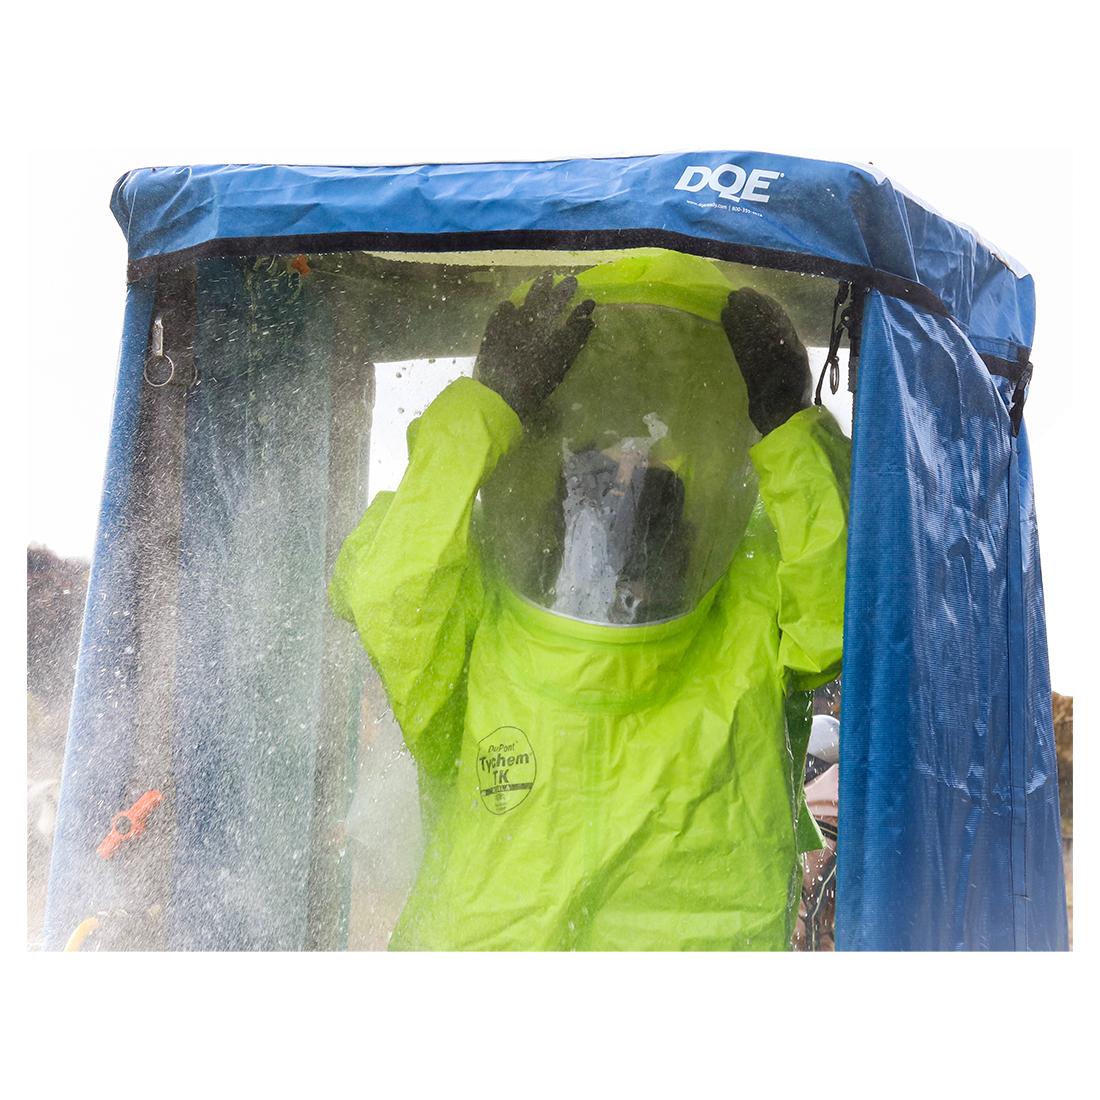 HazMat Shower in use image